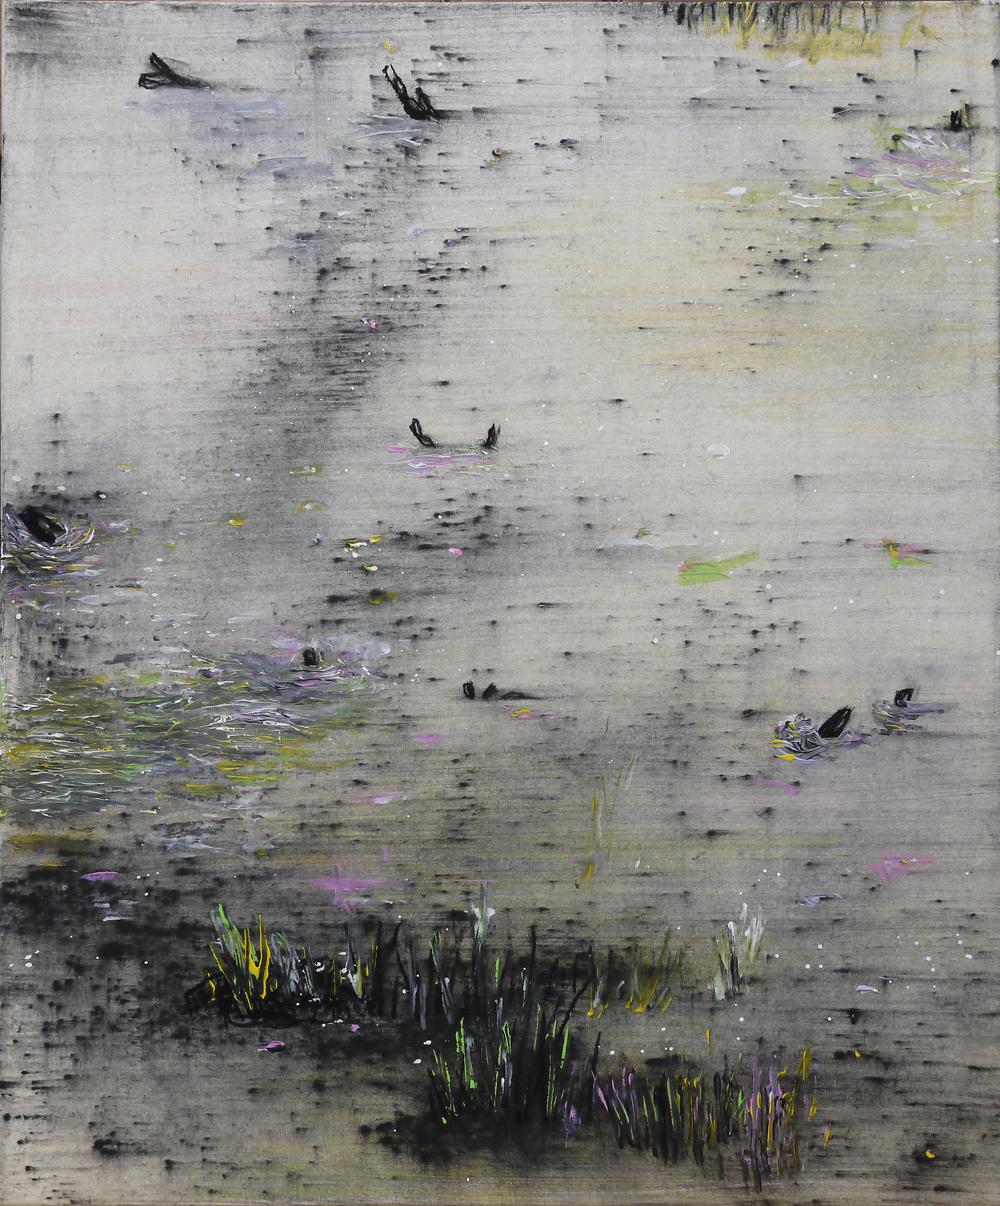 2010 - Rivière / River n°4